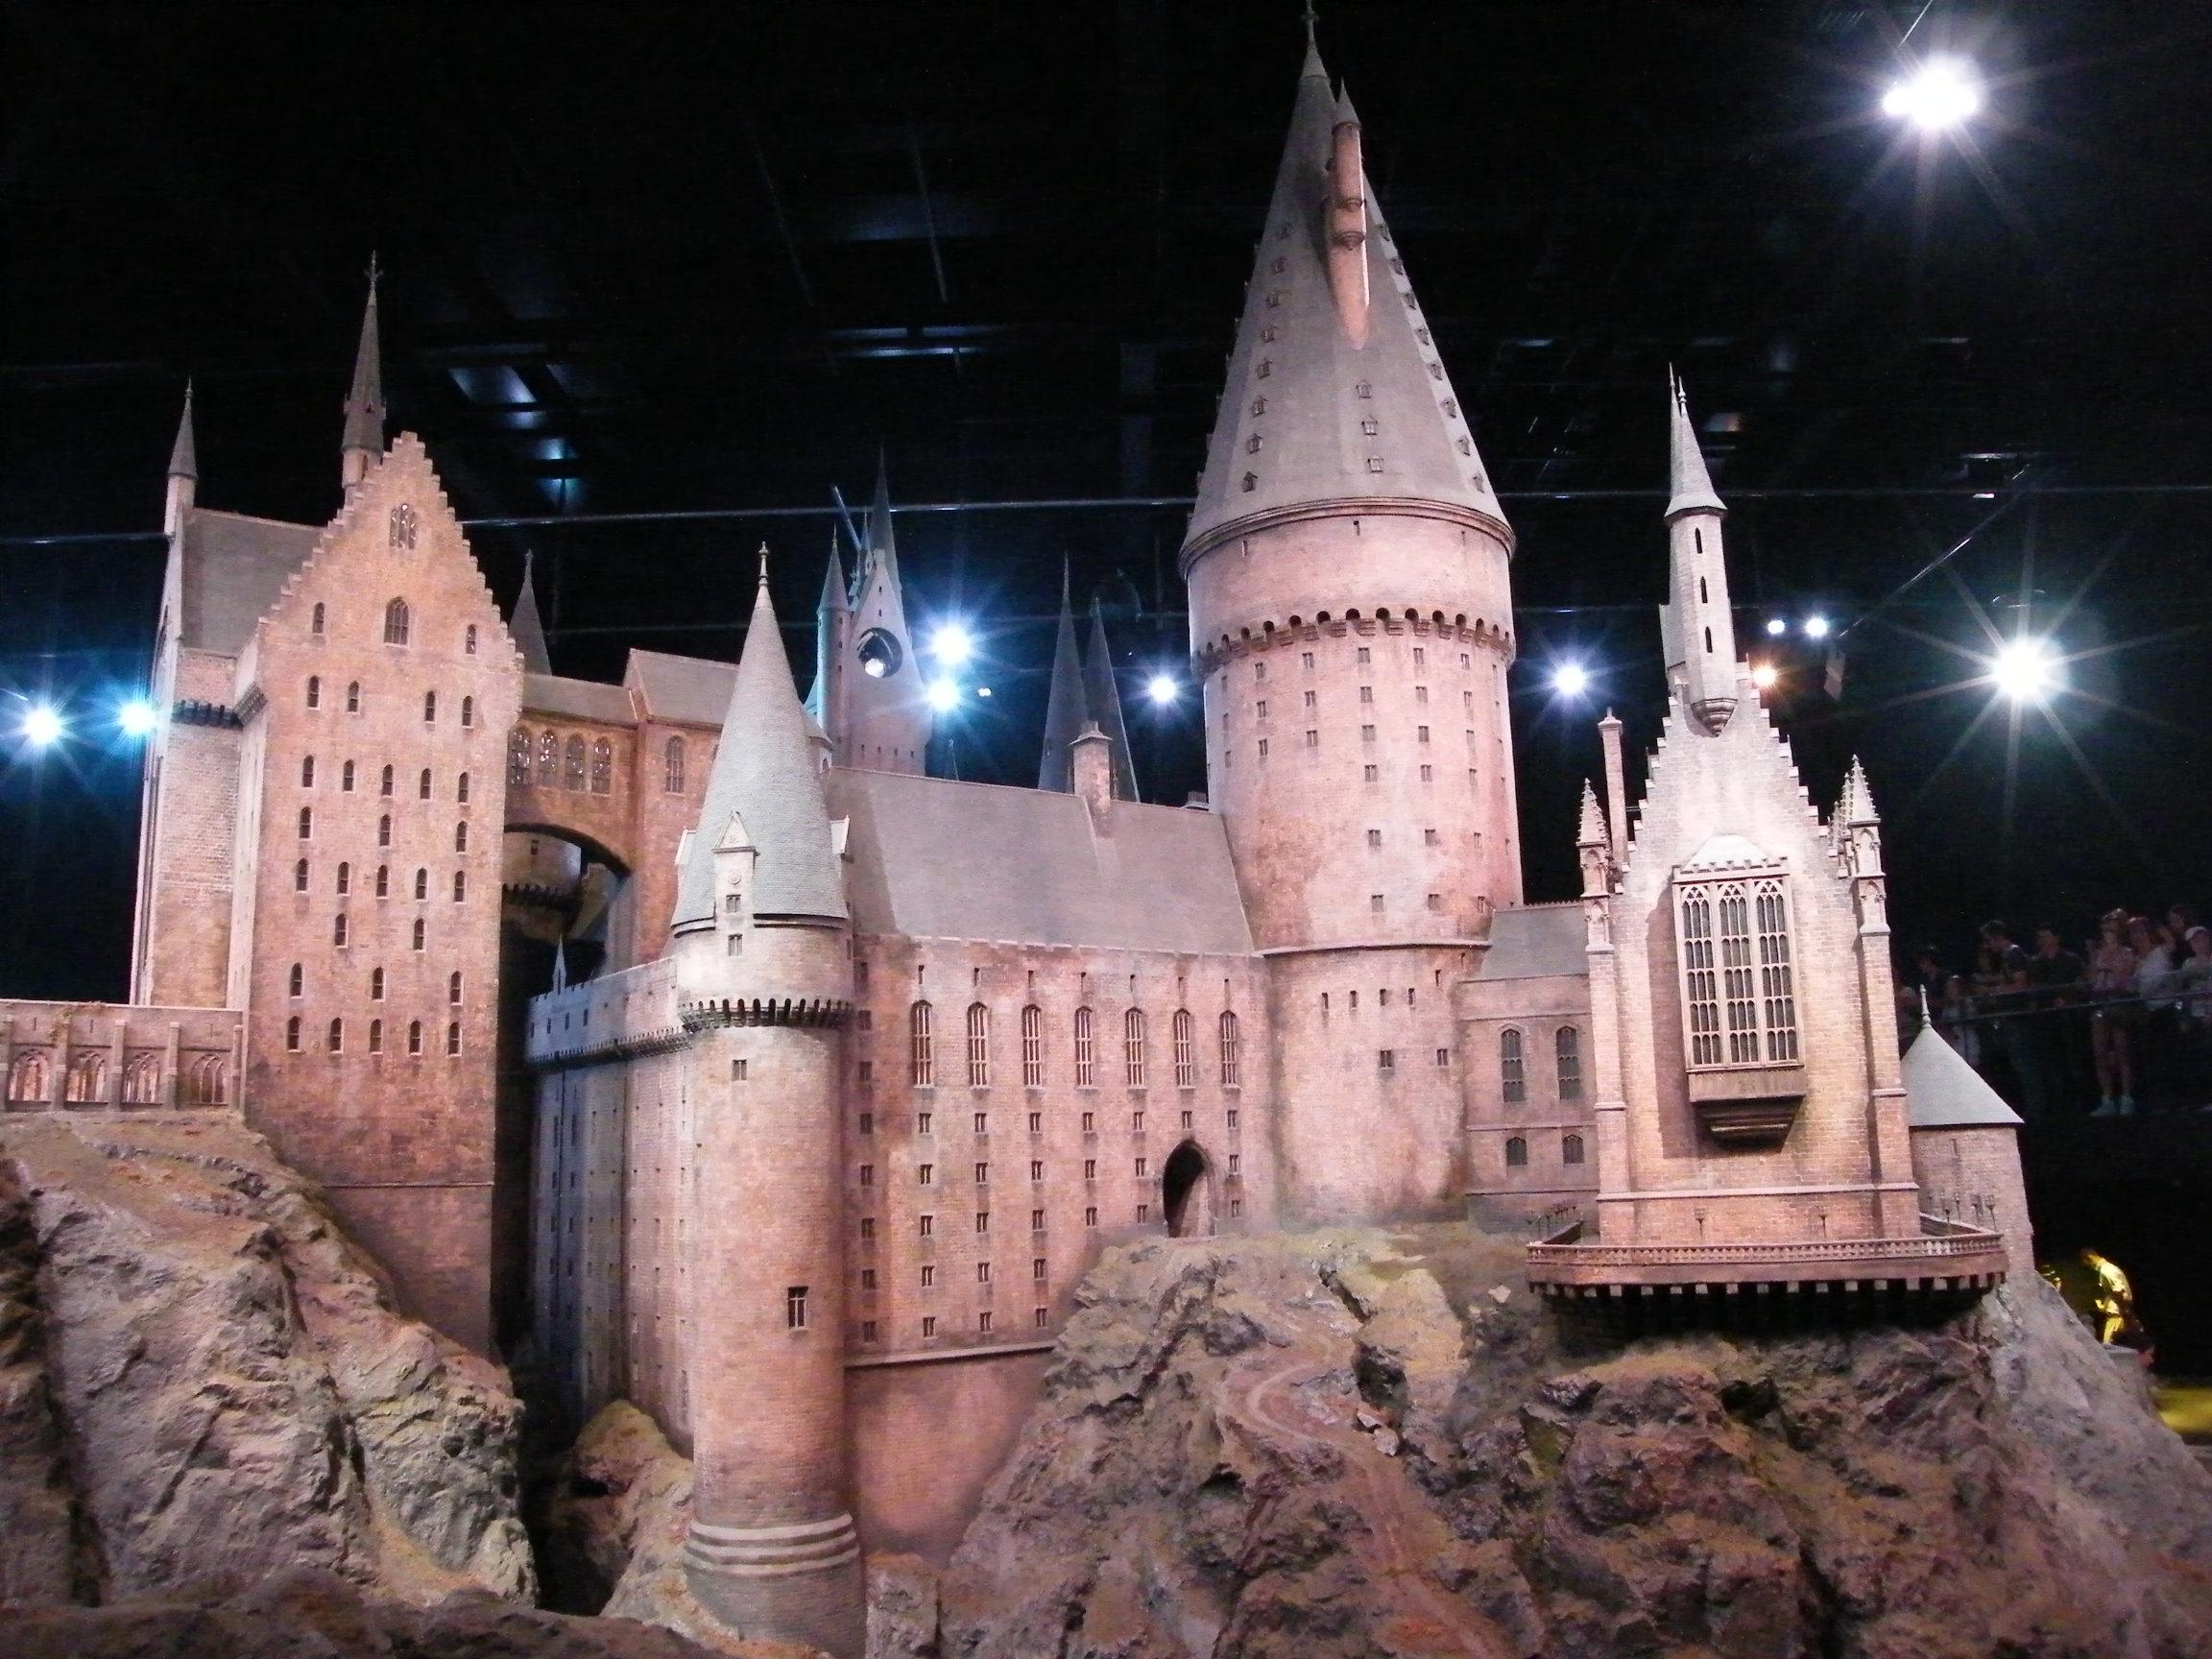 London Harry Potter Studios Hogwarts